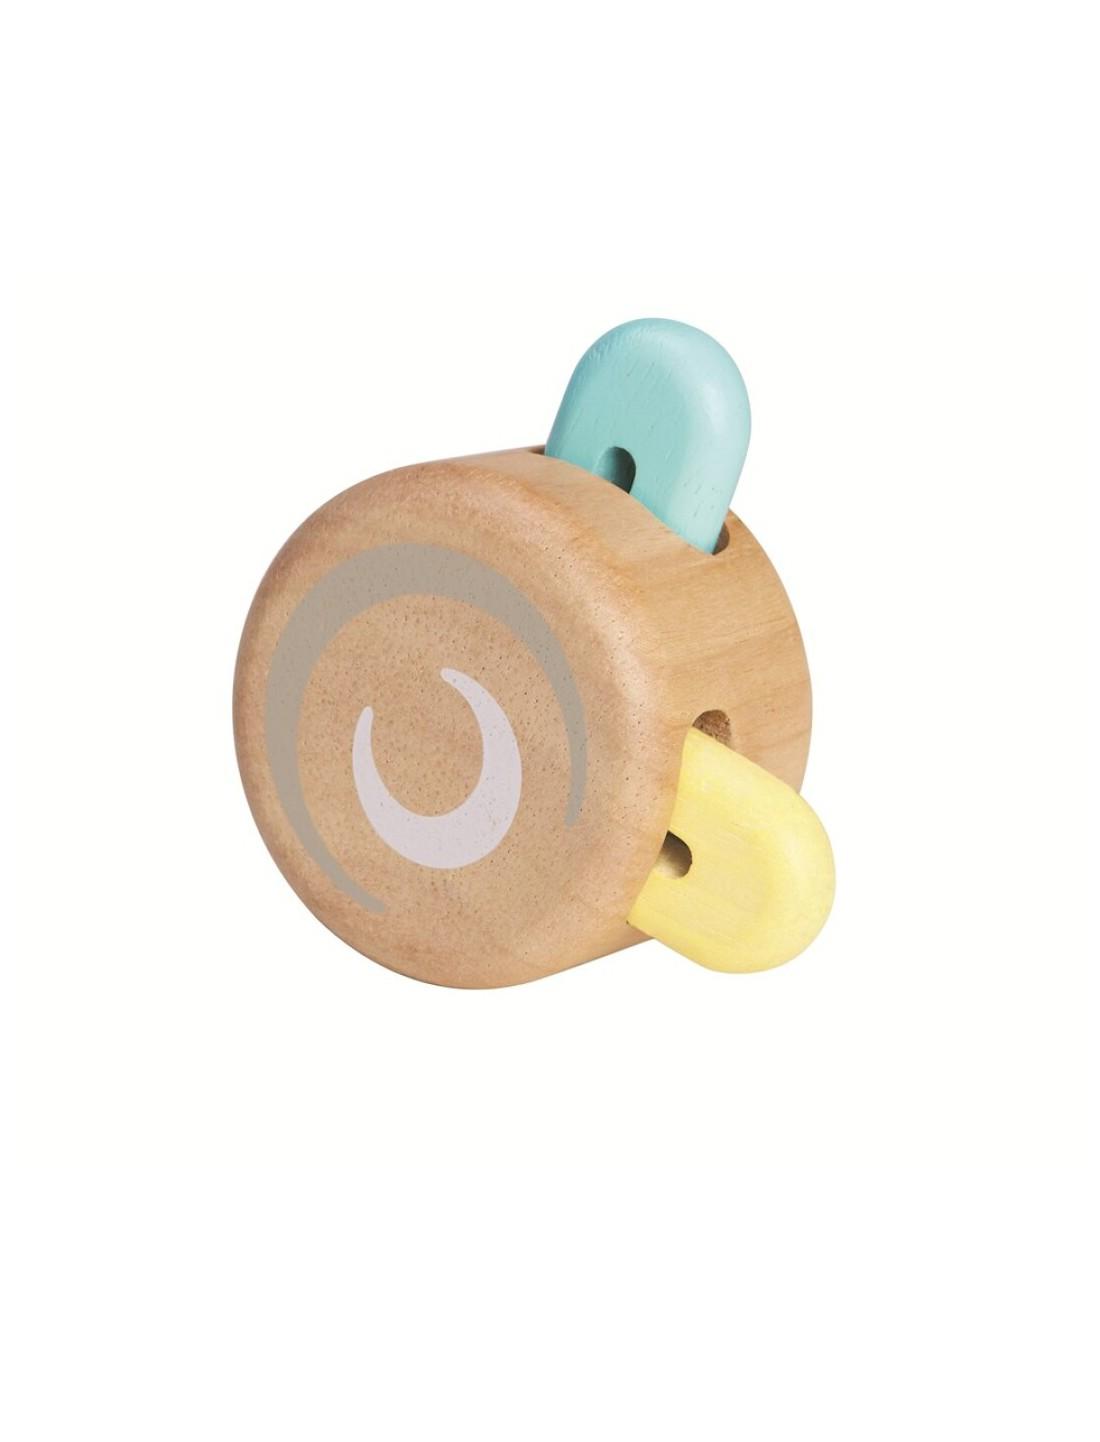 Peek-a-boo roller. Plan Toys